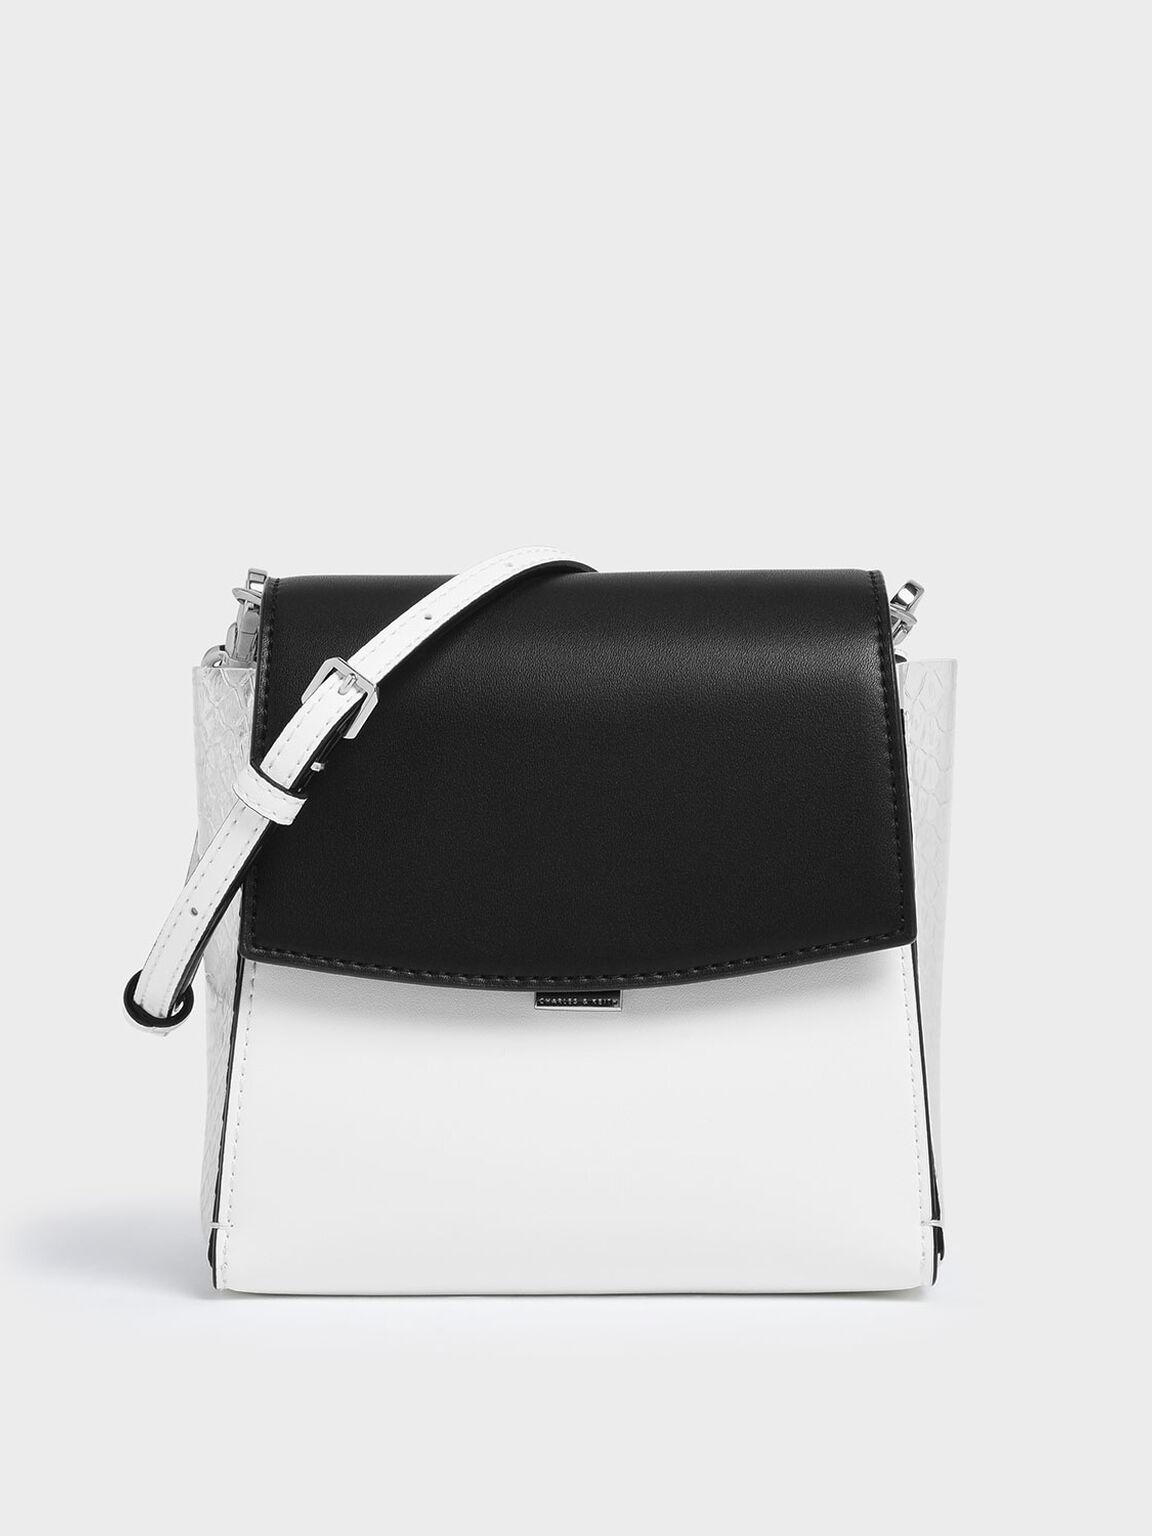 Two-Tone Textured Angular Crossbody Bag, Multi, hi-res